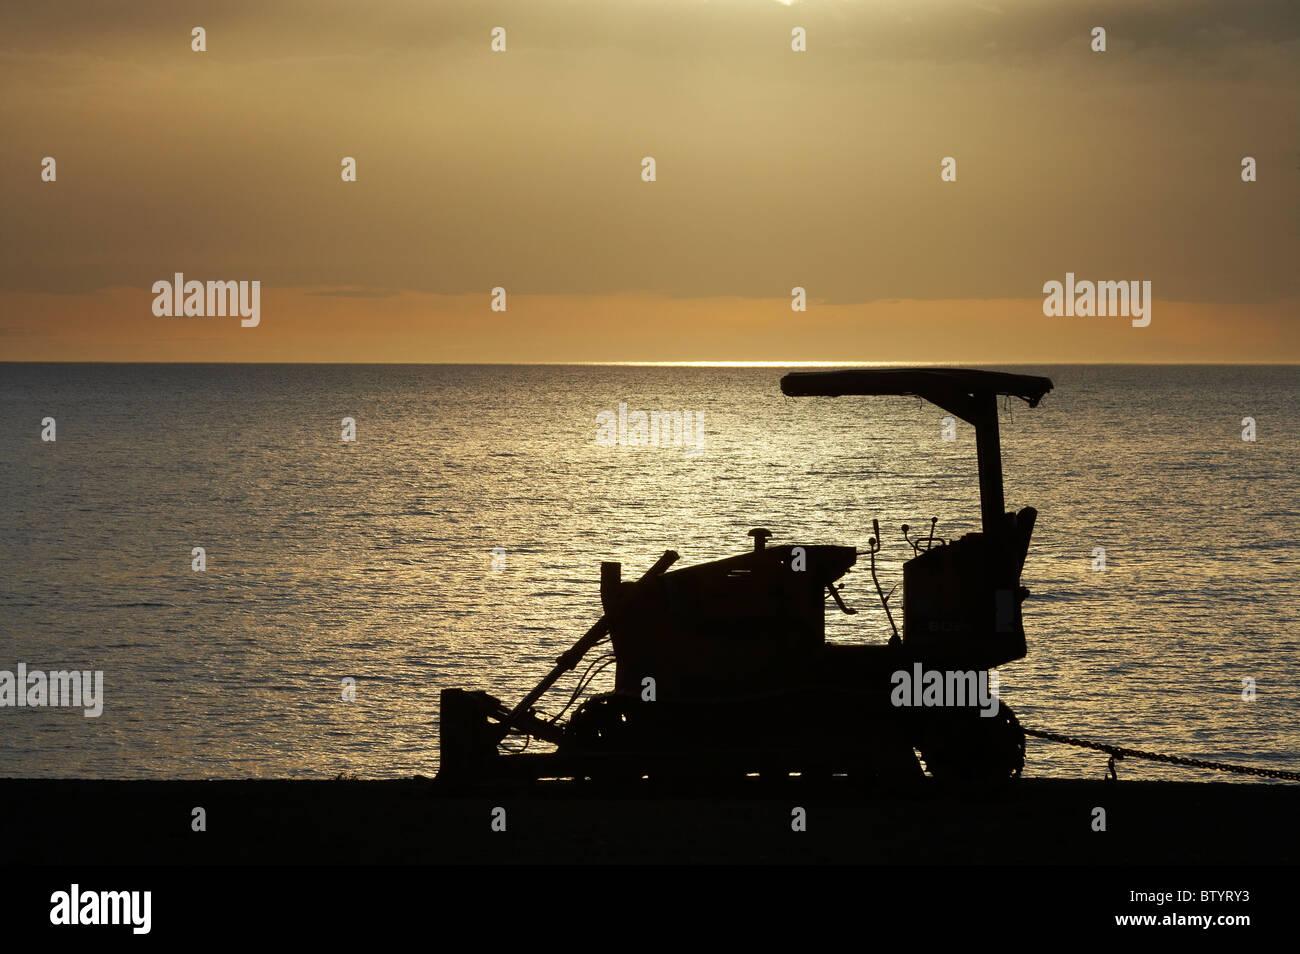 Dawn over bulldozer used for raking beach, Napier Waterfront, Hawkes Bay, North Island, New Zealand - Stock Image